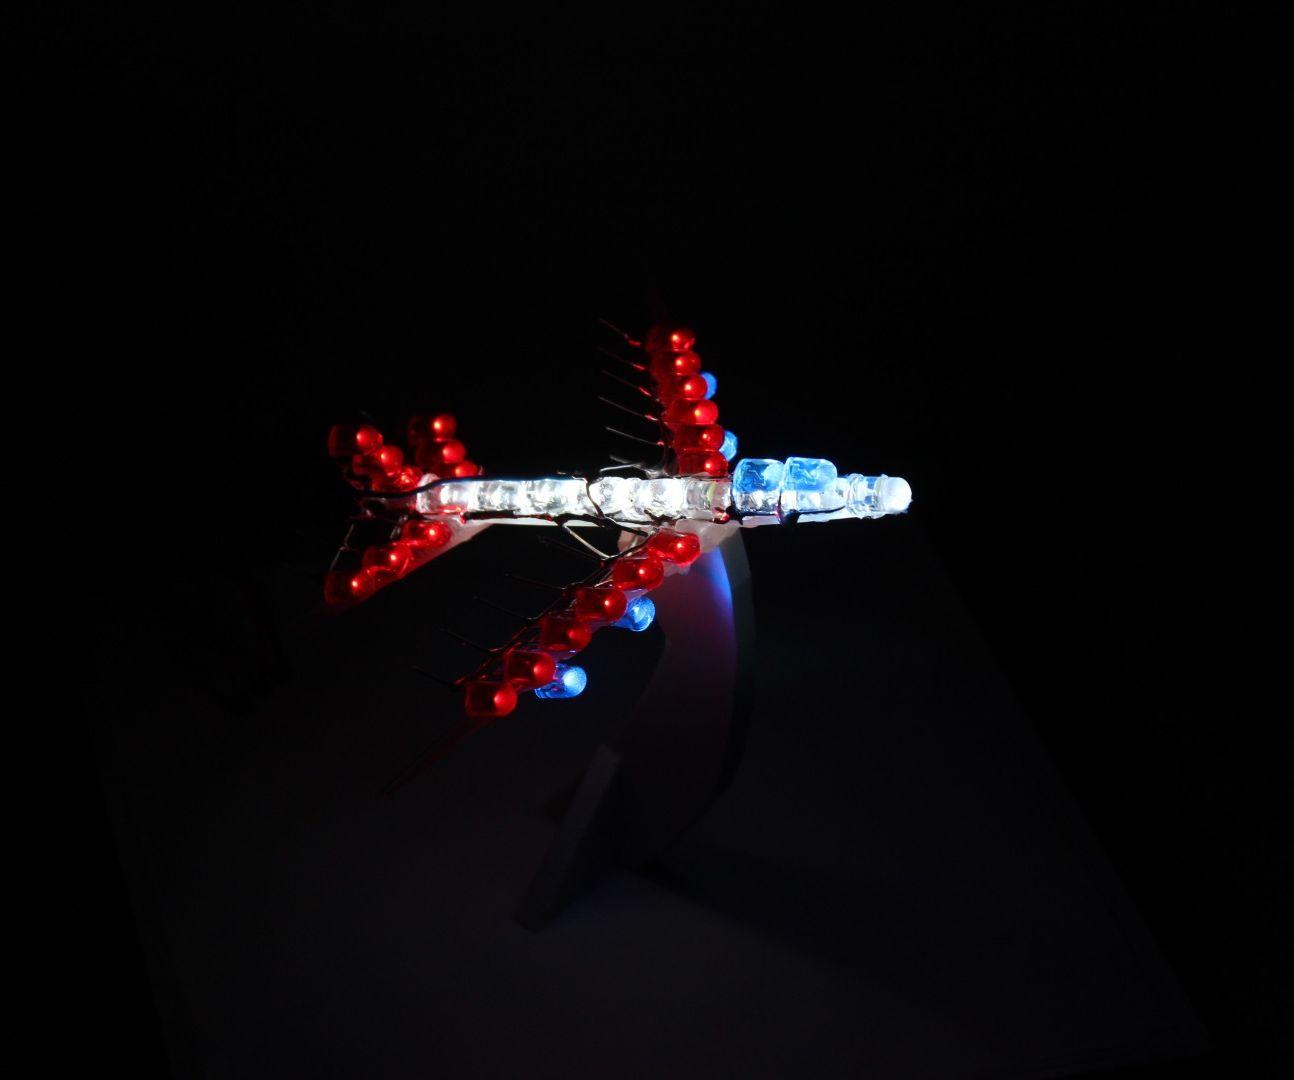 Handmade LED Airplane